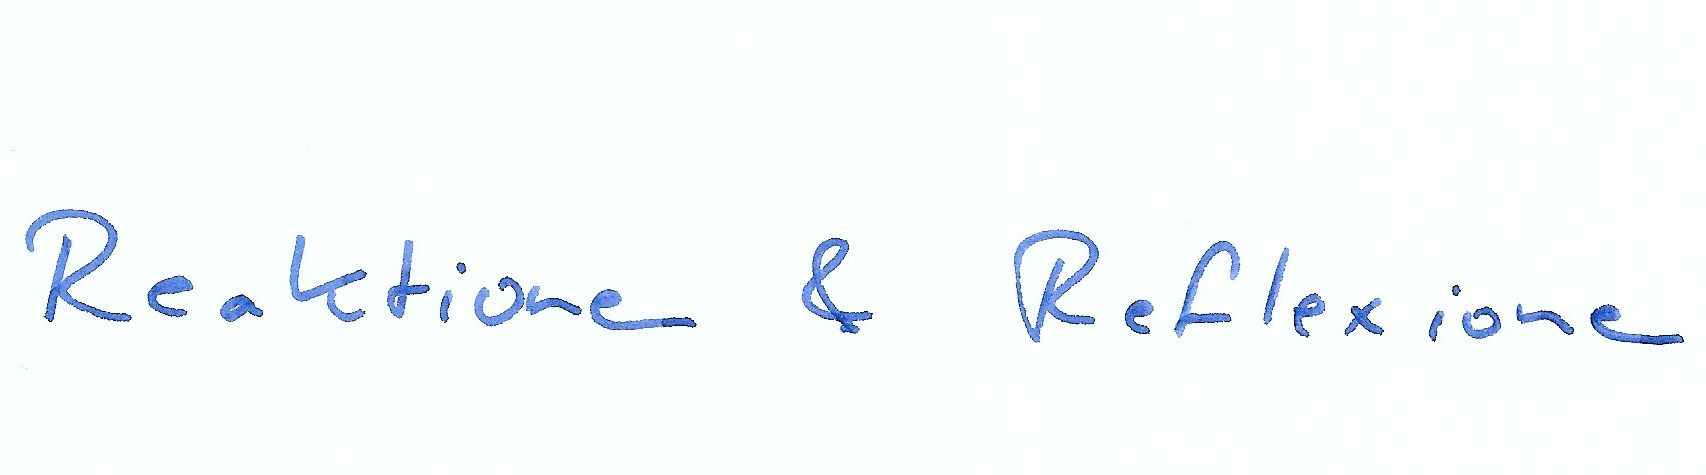 Notizen ohne Tinte